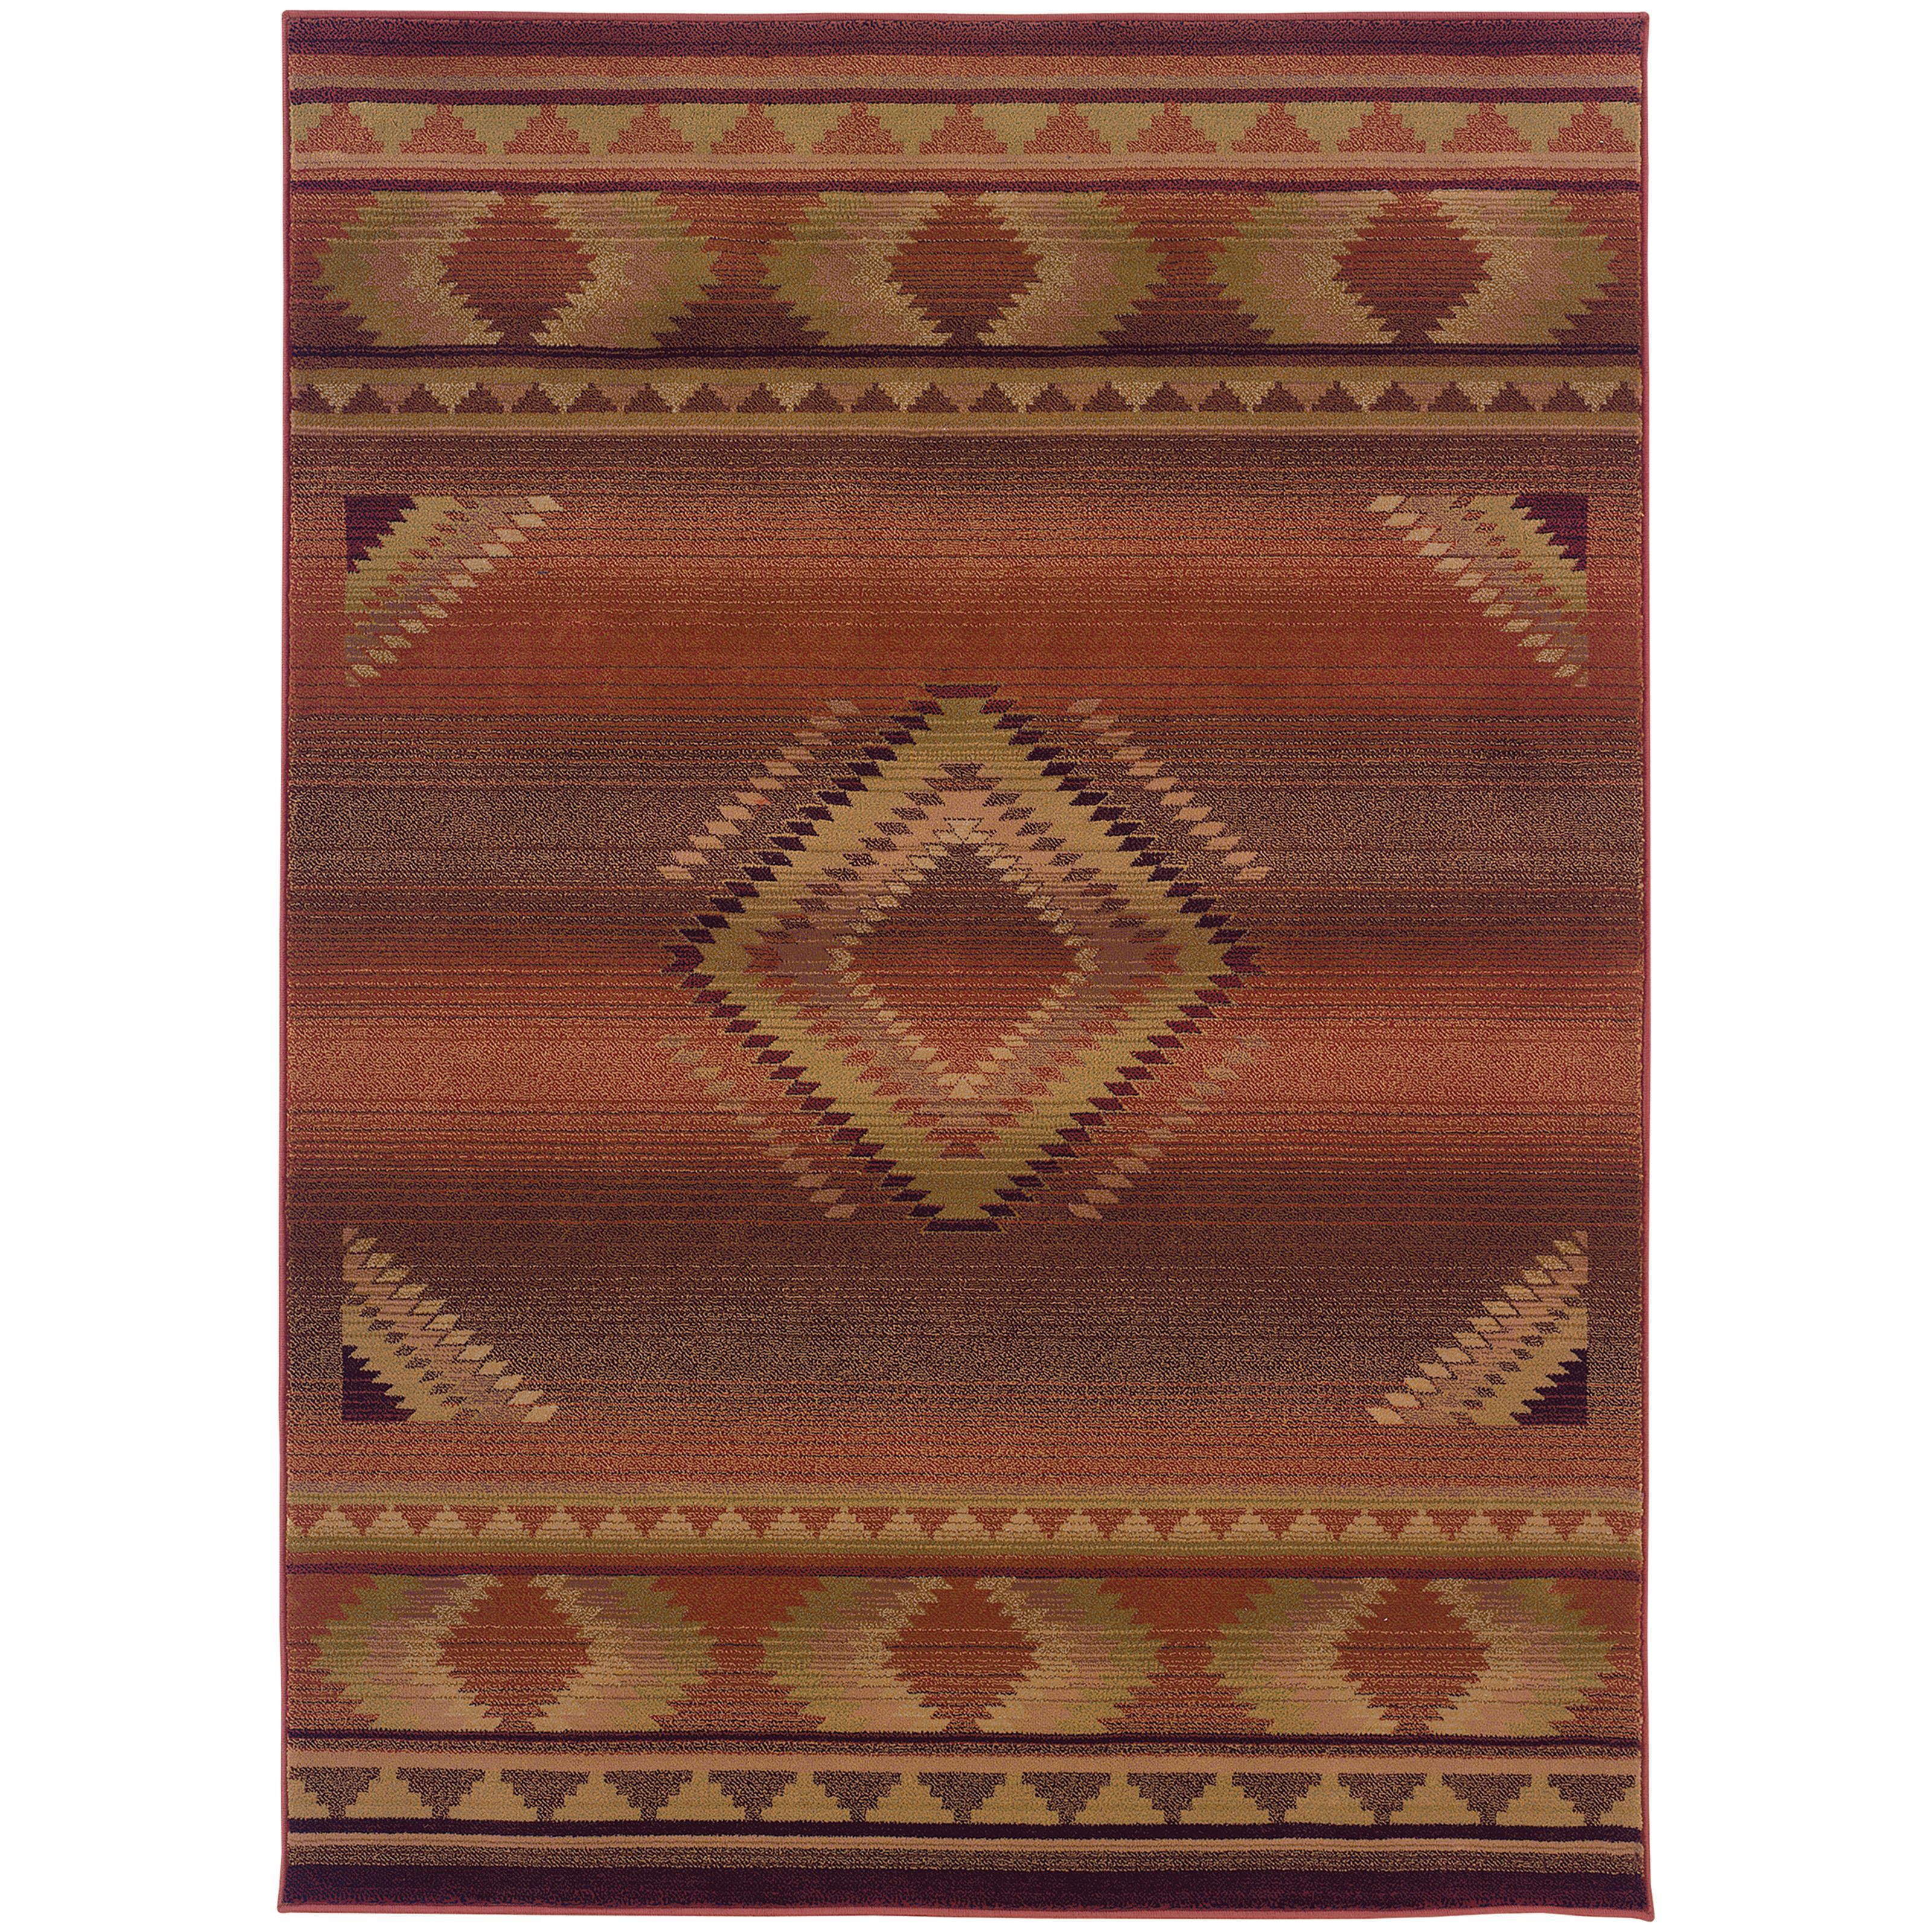 "Oriental Weavers Generations 4' X  5' 9"" Rug - Item Number: G1506C120180CST"